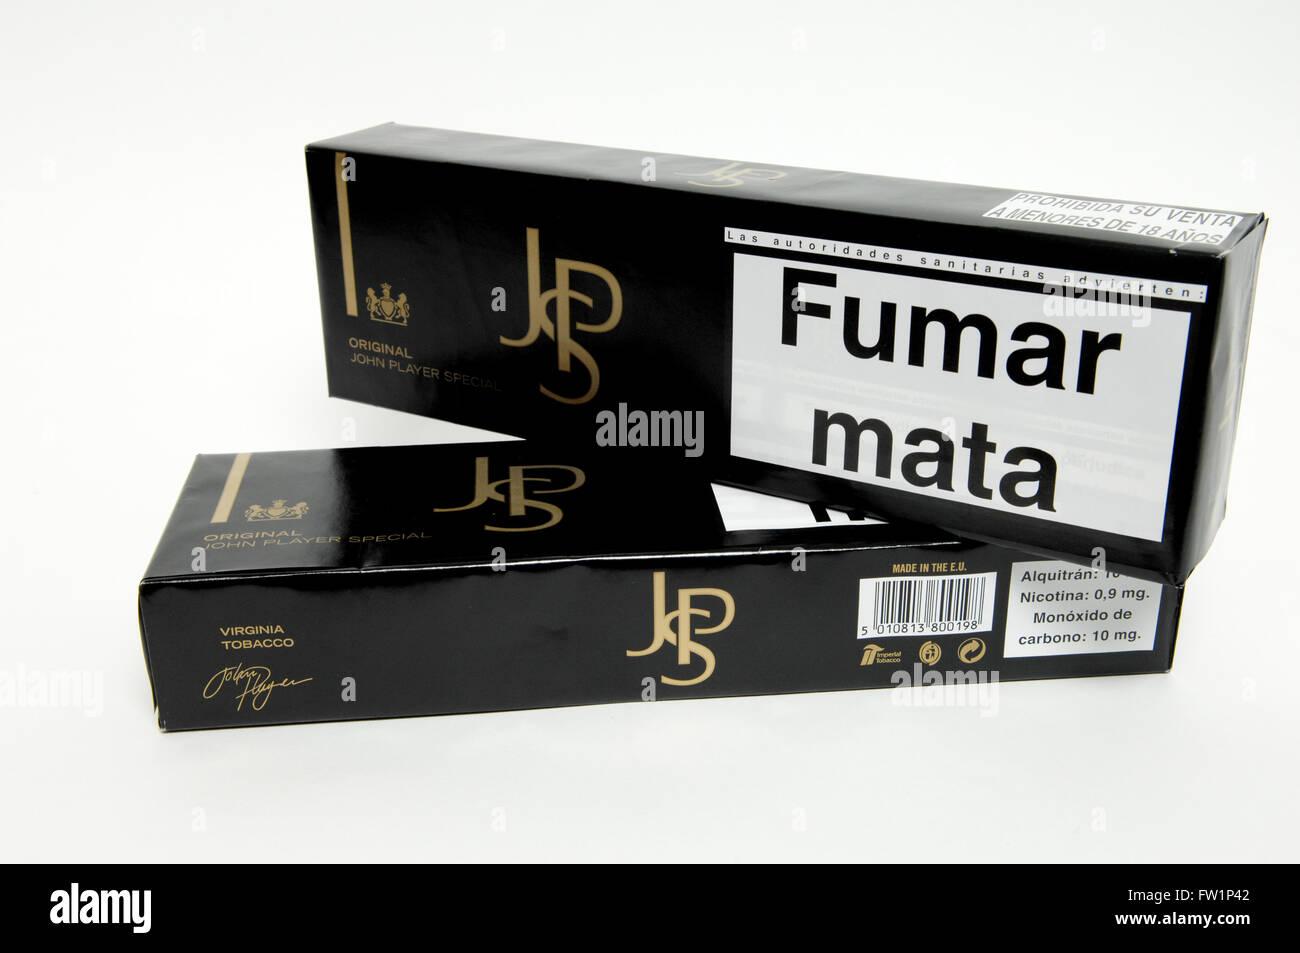 What are cheap cigarette brands